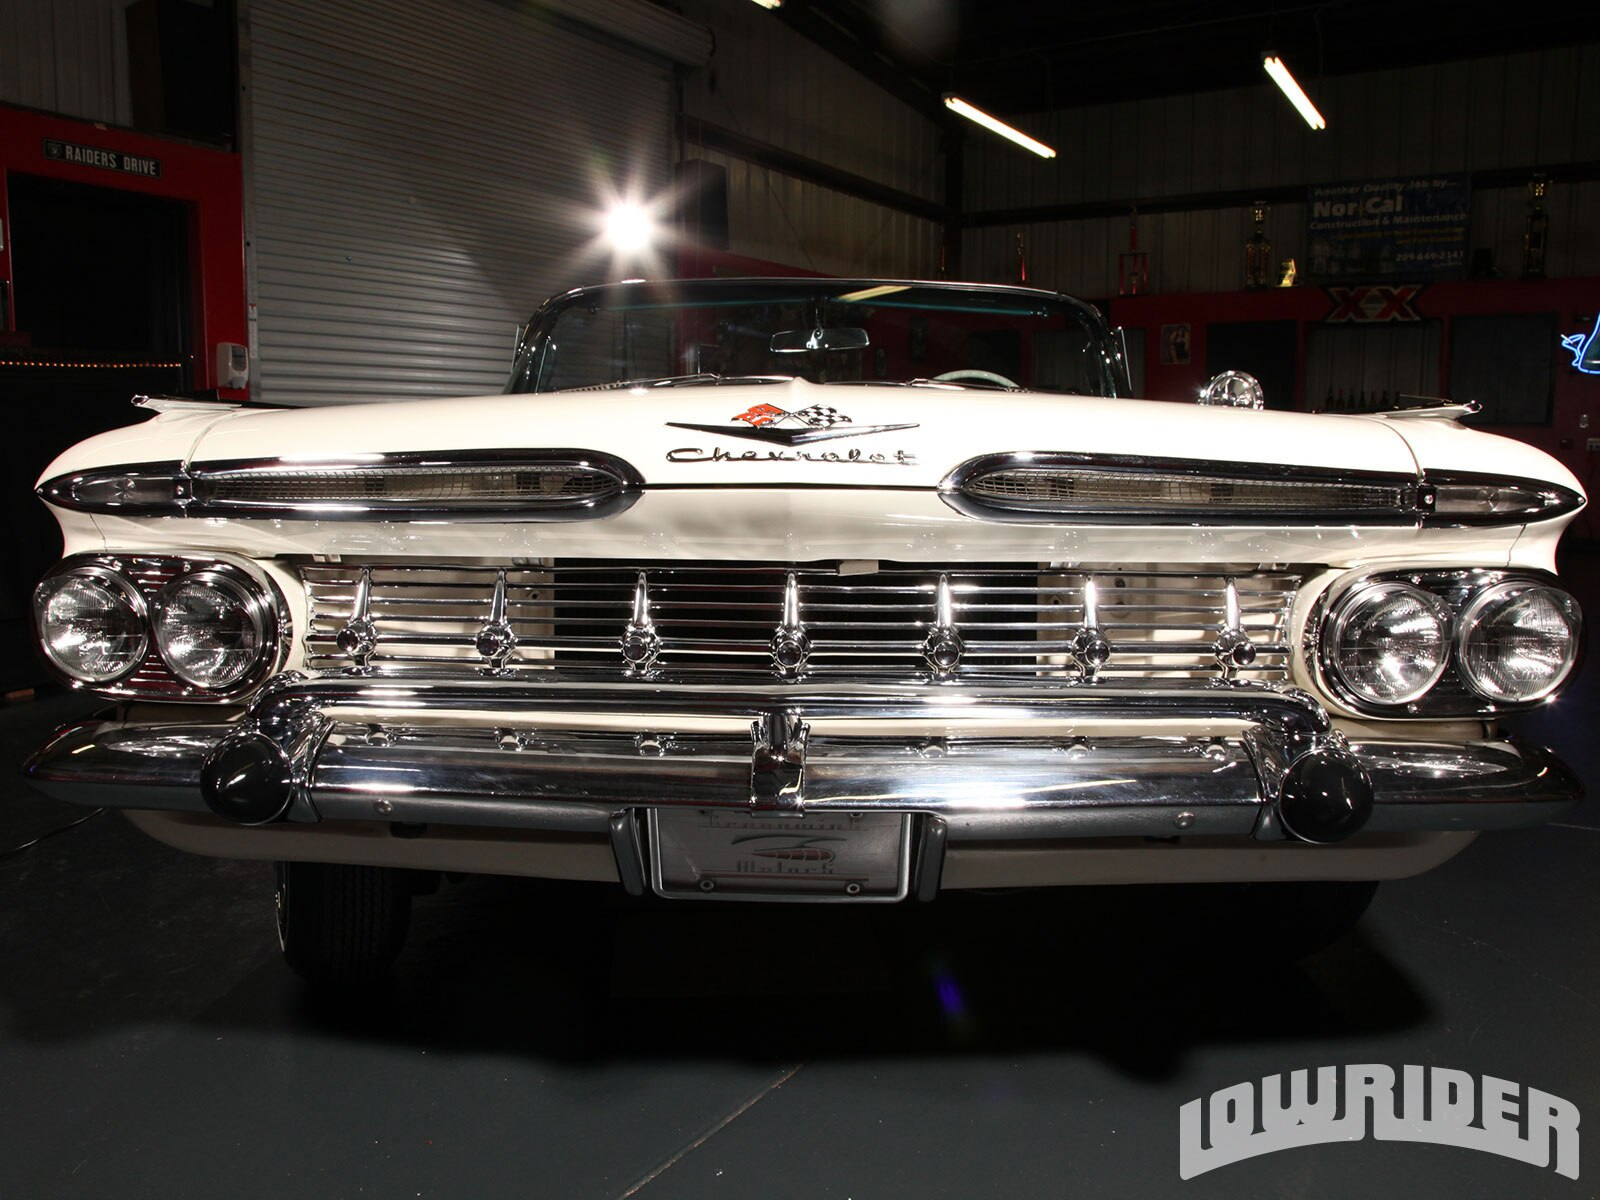 1985 Buick Regal >> 1959 Chevrolet Impala - Lowrider Magazine